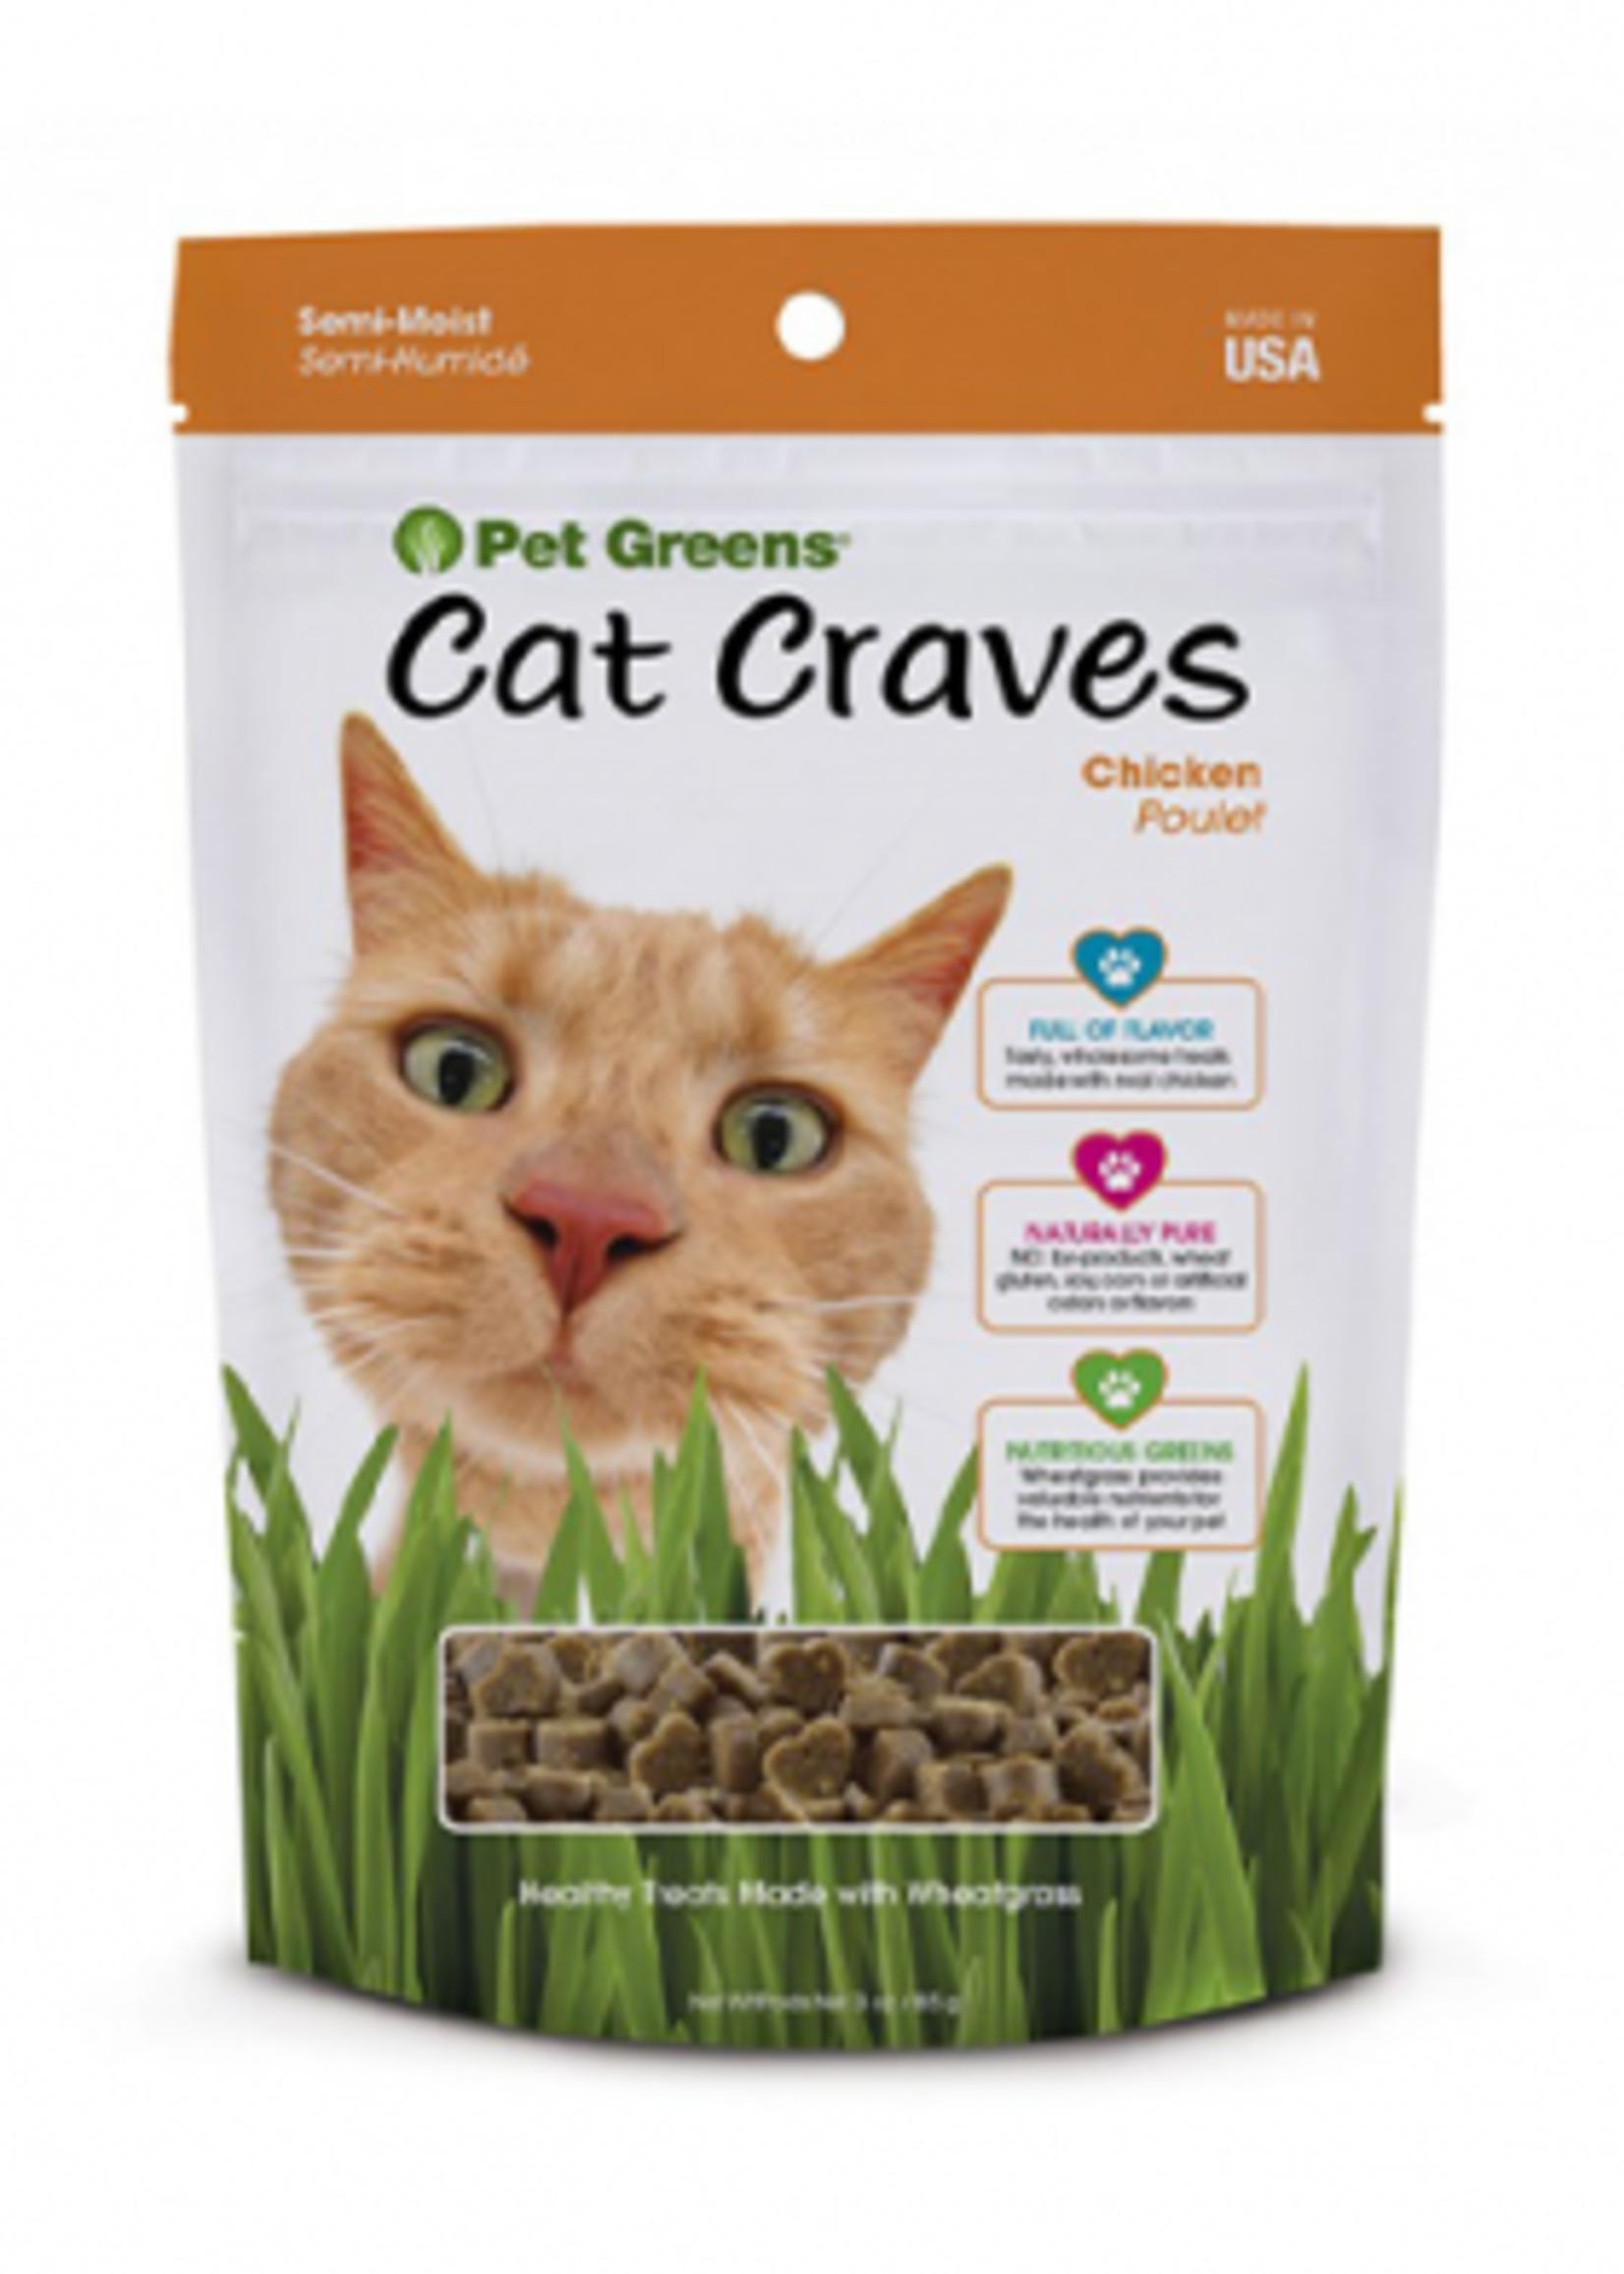 Pet Greens® Pet Greens Cat Craves Roasted Chicken 3oz